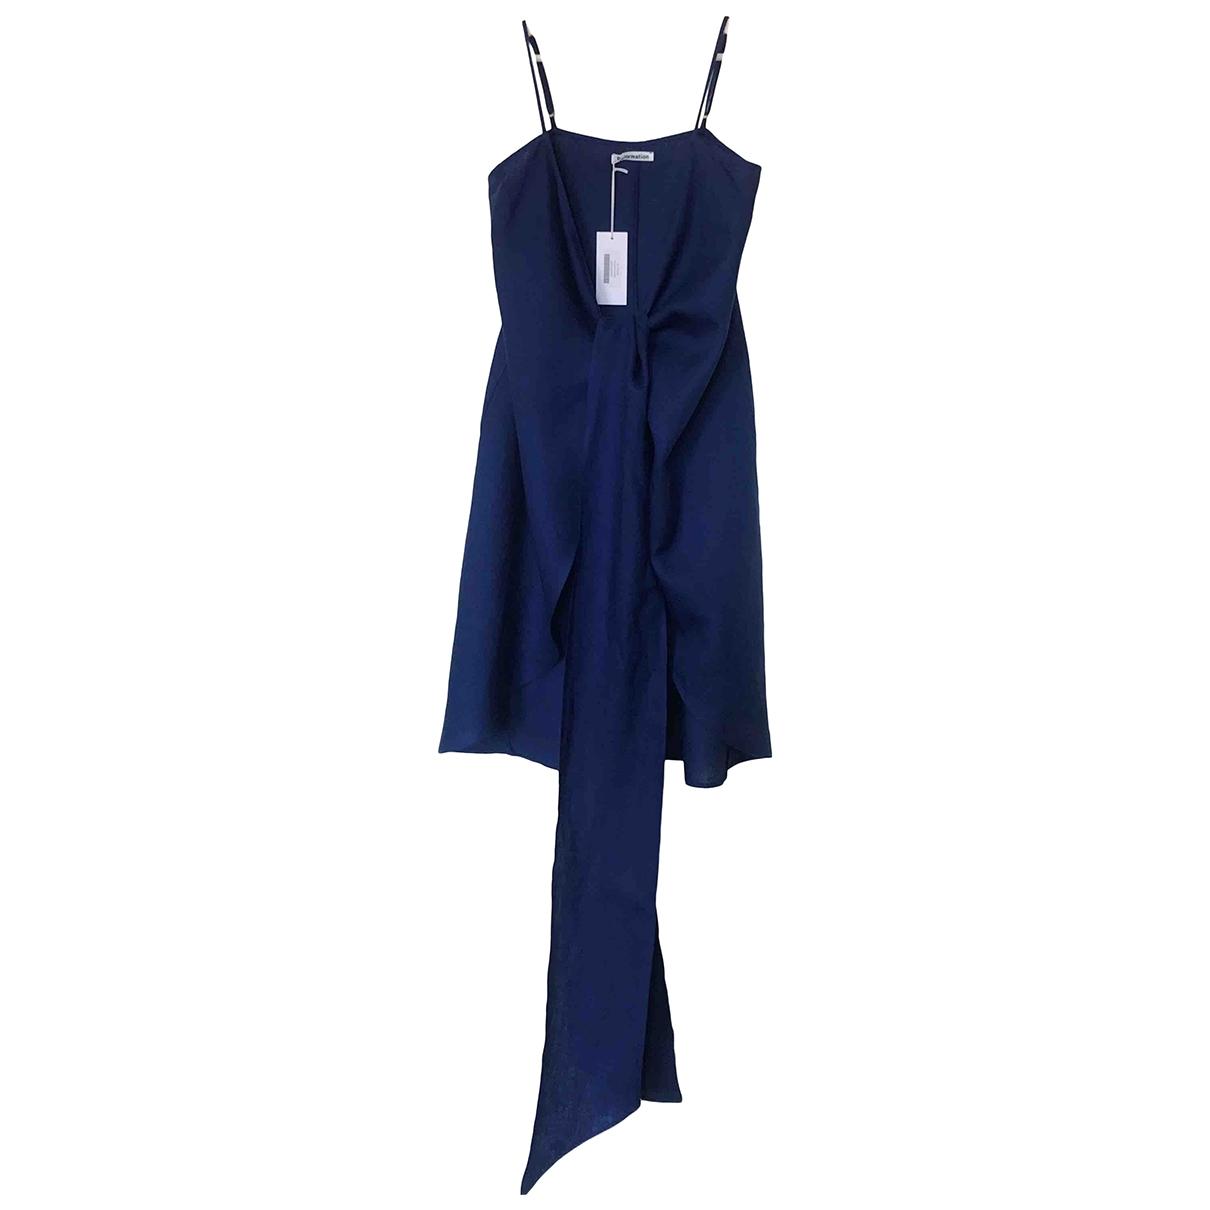 Reformation Linen mid-length dress